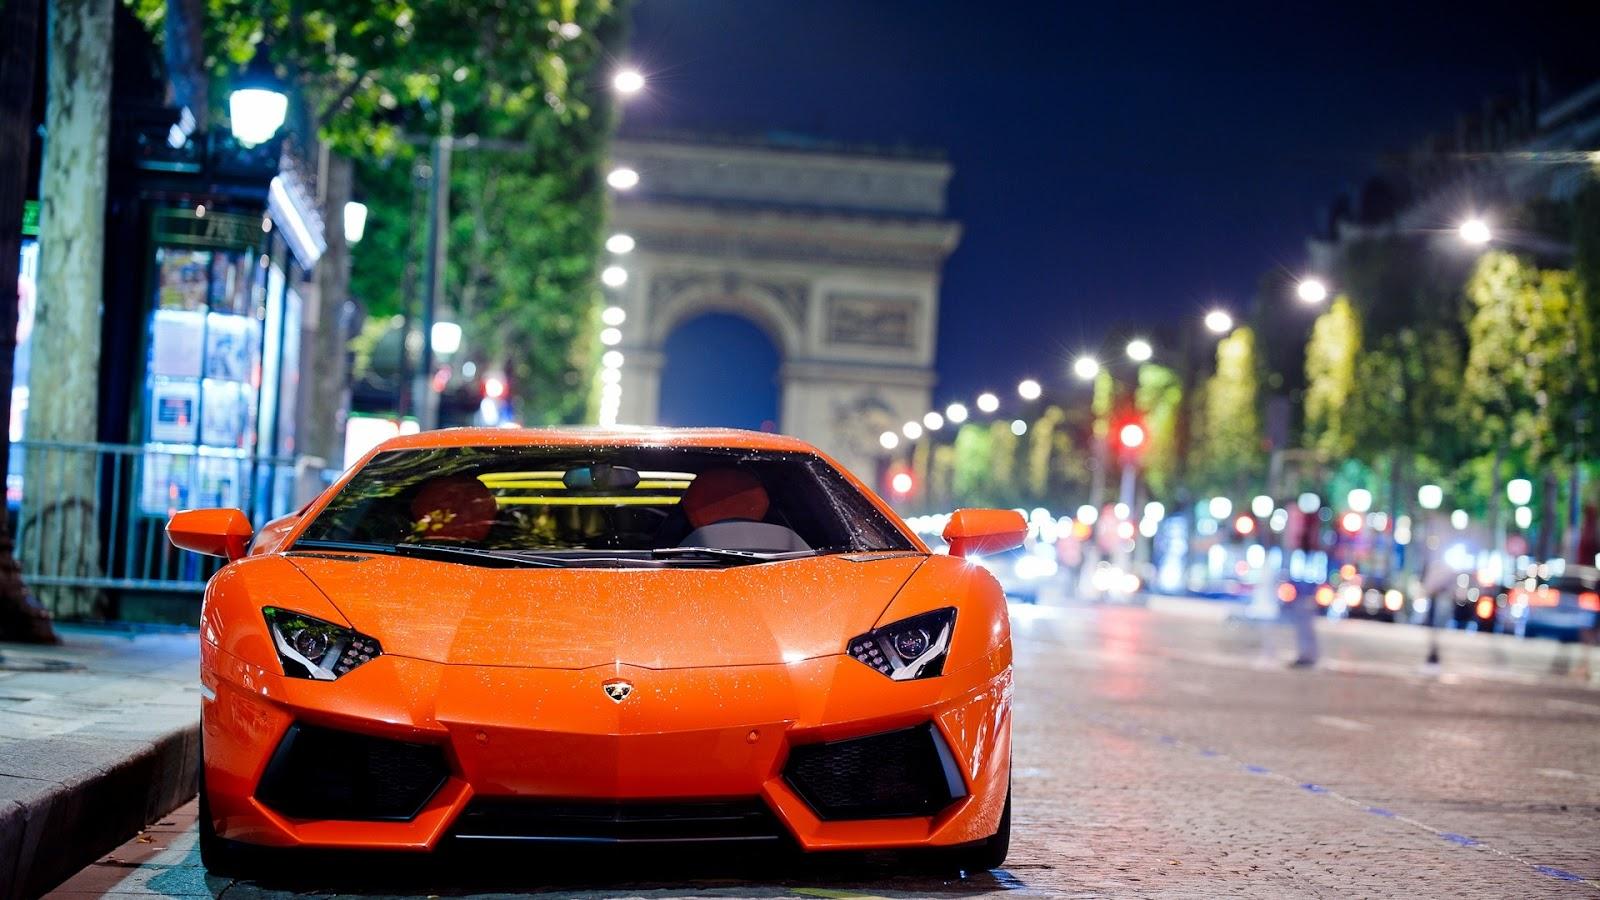 Lamborghini Cars HD wallpapers Download 1080p Ultra HD Wallpapers 1600x900